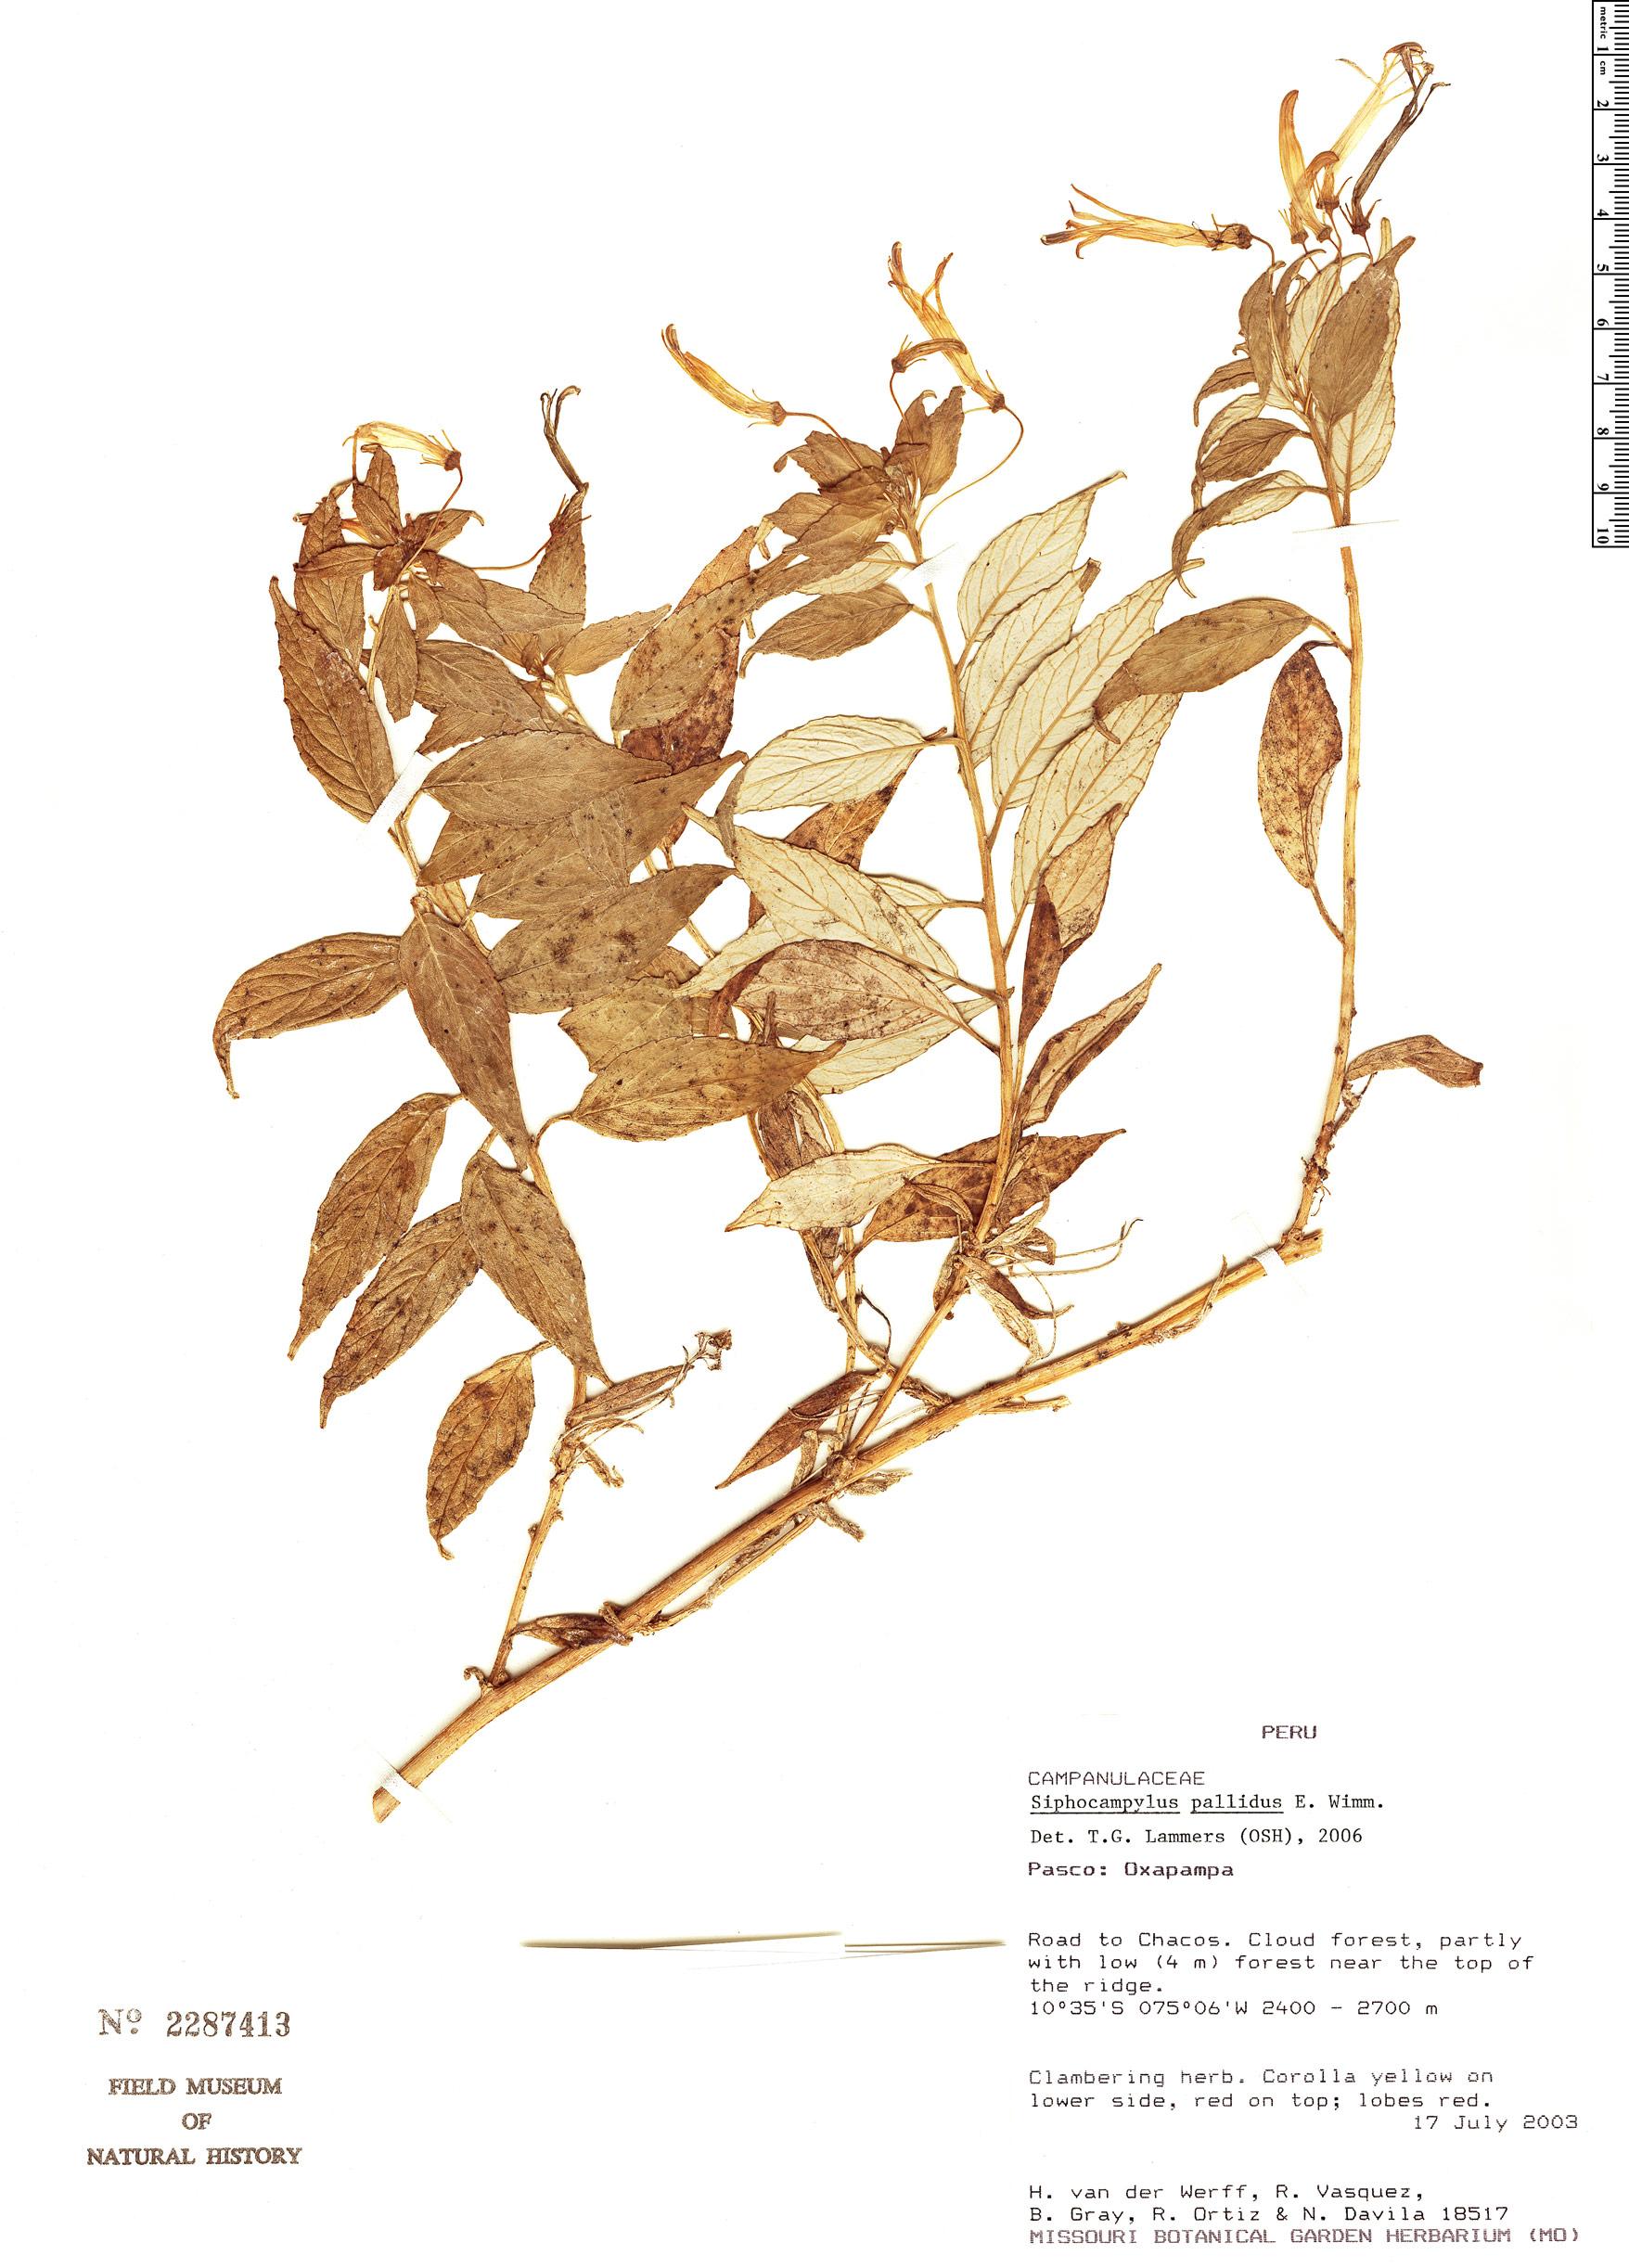 Specimen: Siphocampylus pallidus